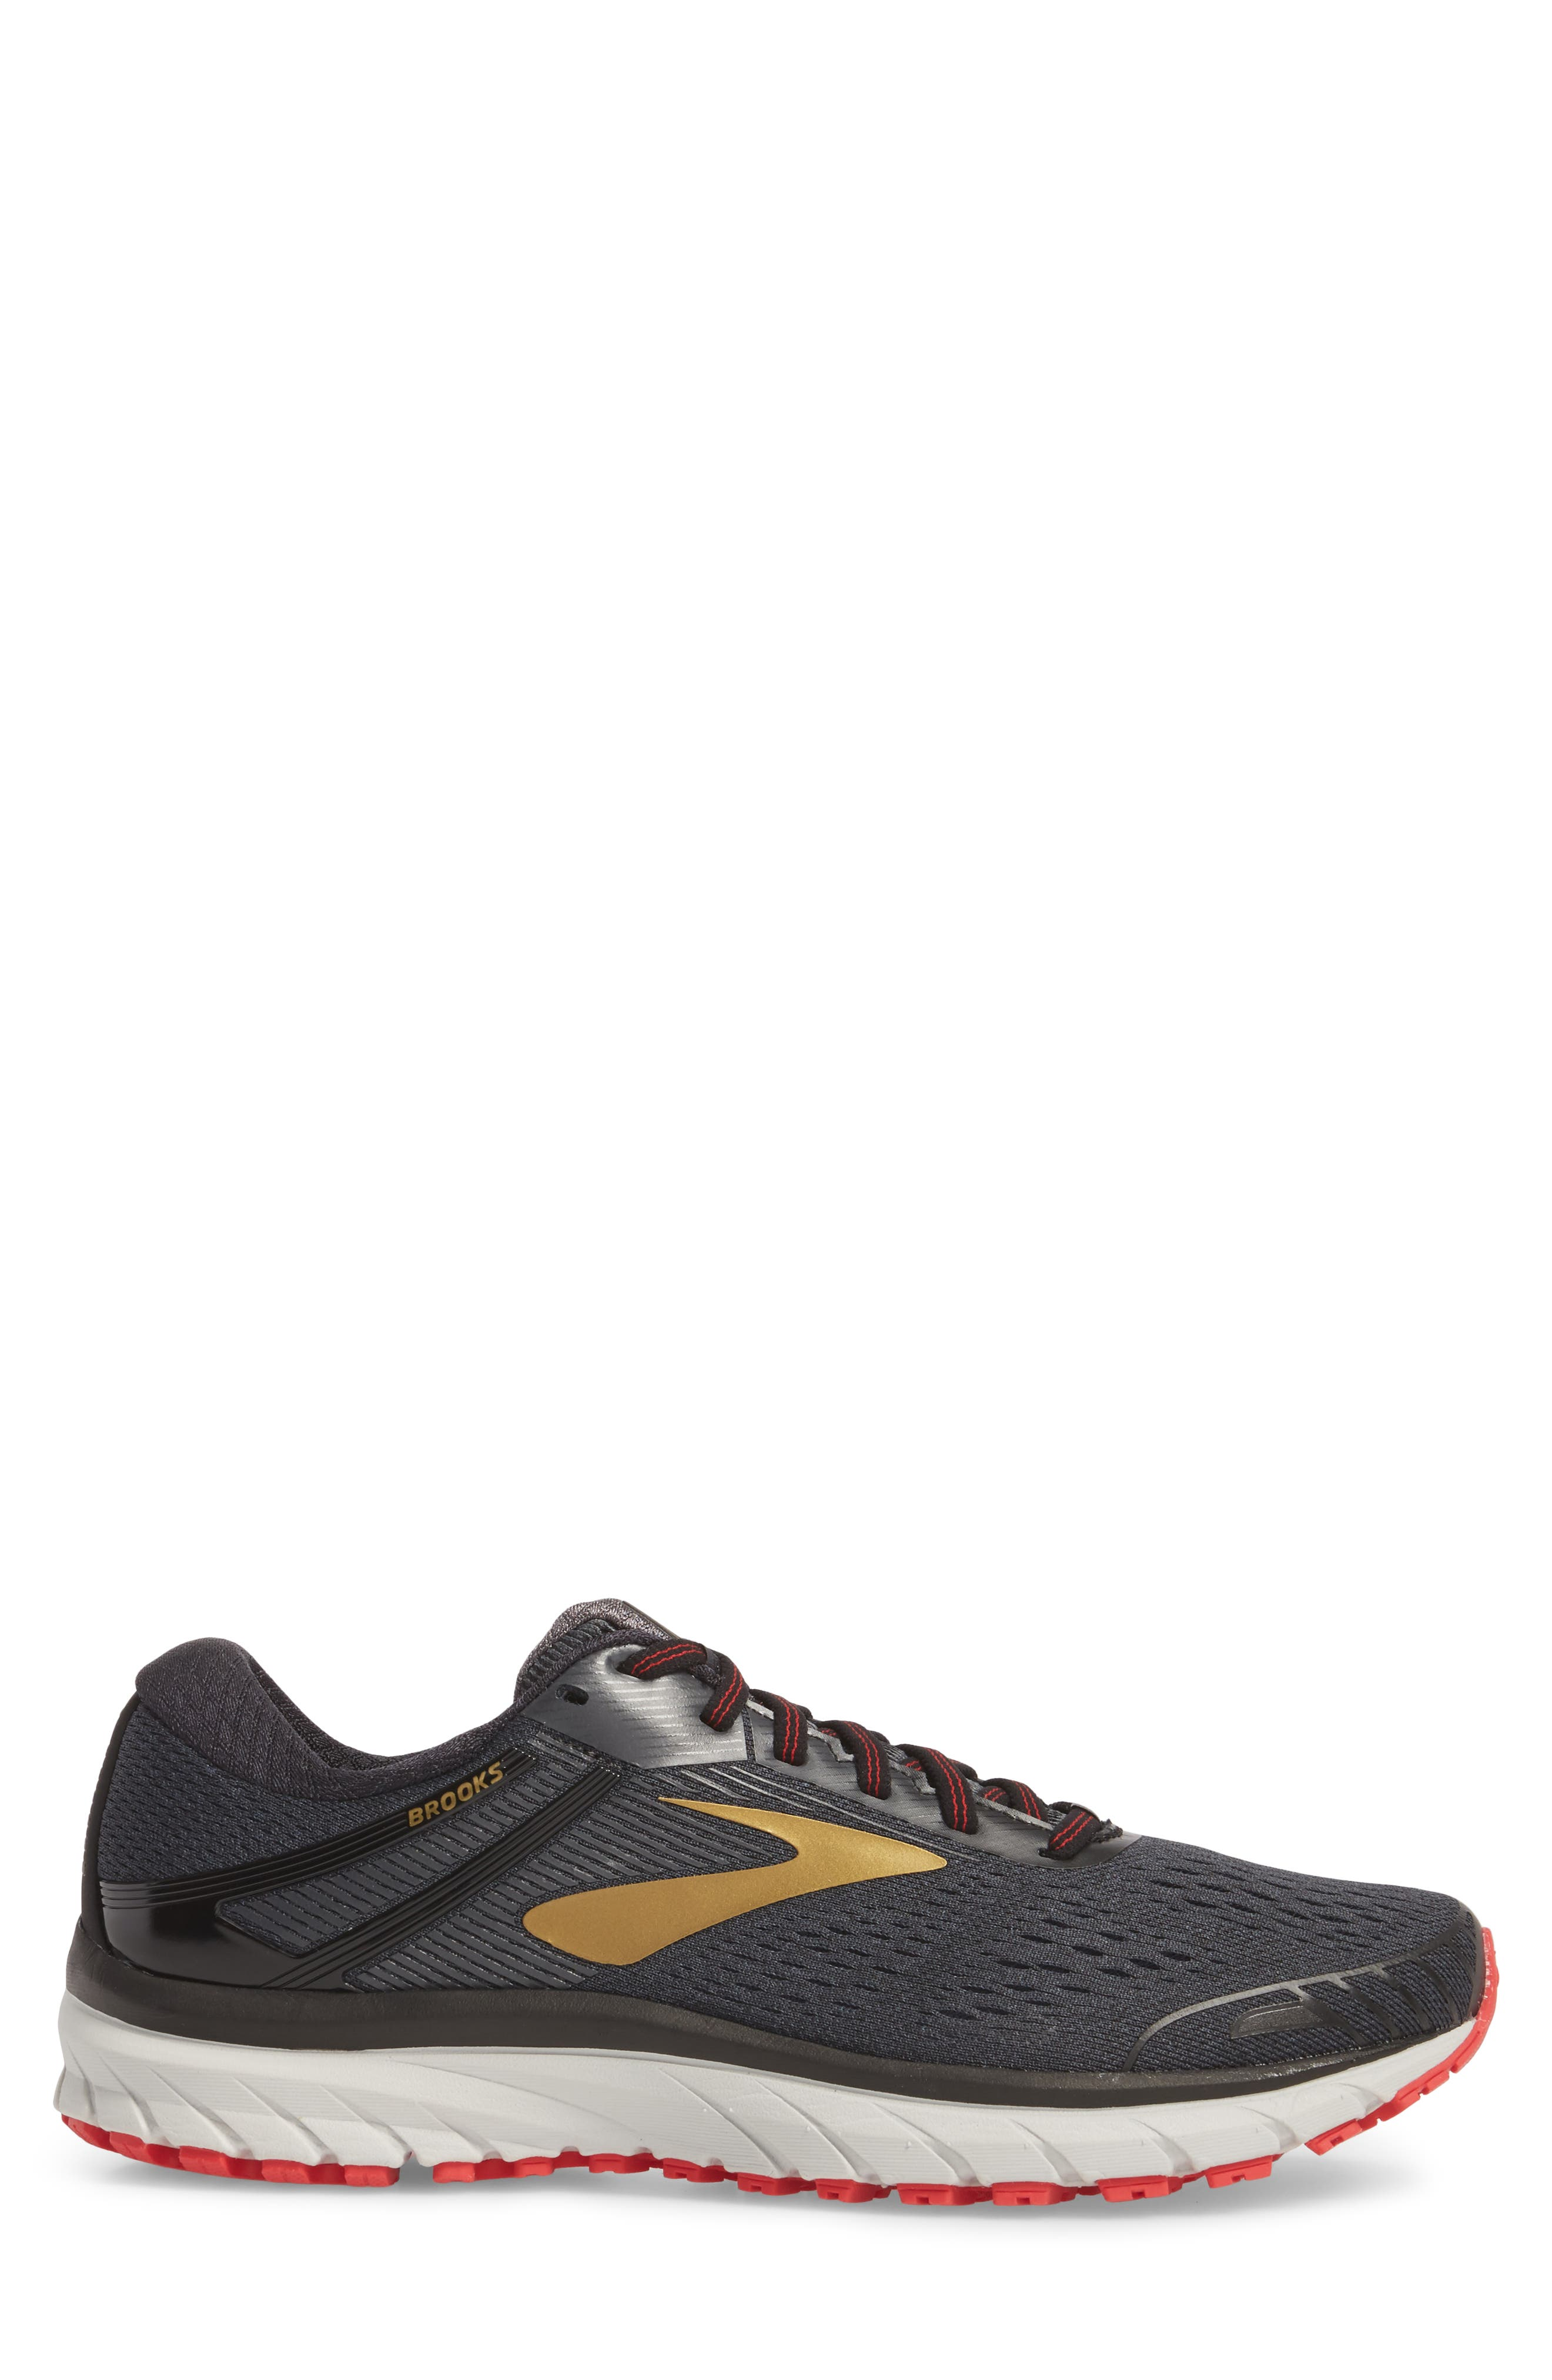 Adrenaline GTS 18 Running Shoe,                             Alternate thumbnail 3, color,                             BLACK/ GOLD/ RED